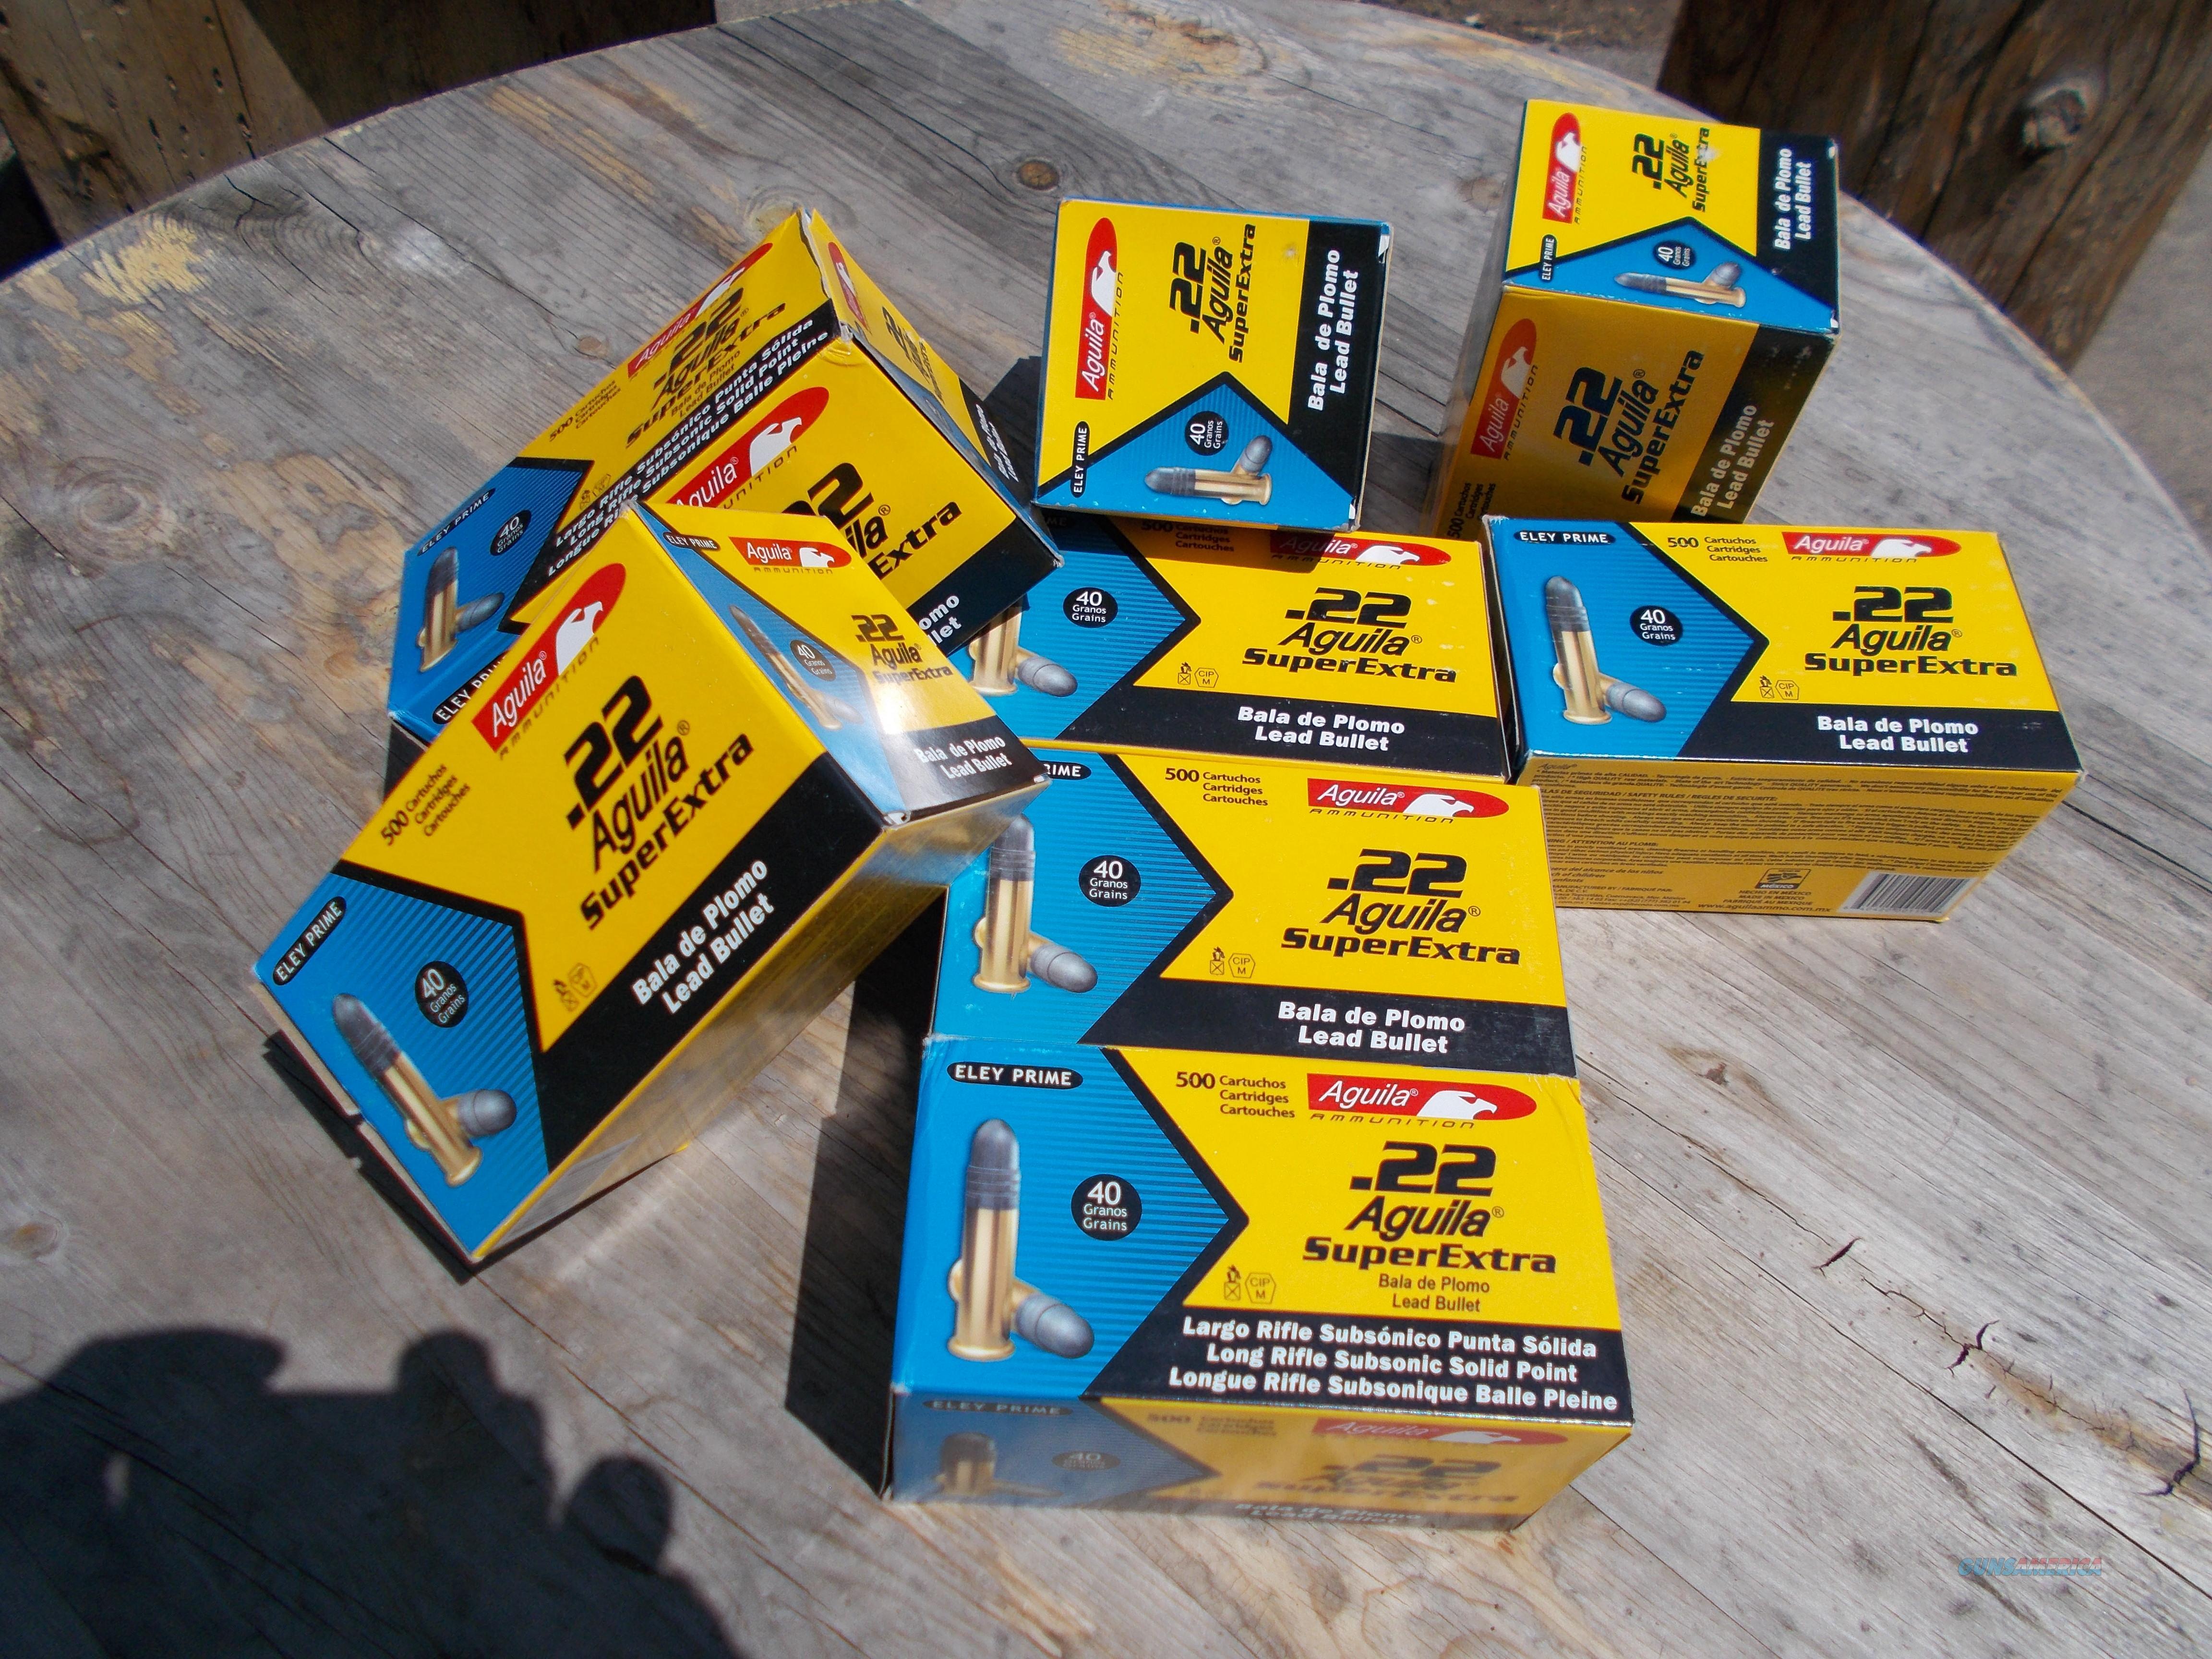 Aguila super extra 22 lr 20.00 for box of 500  Non-Guns > Ammunition